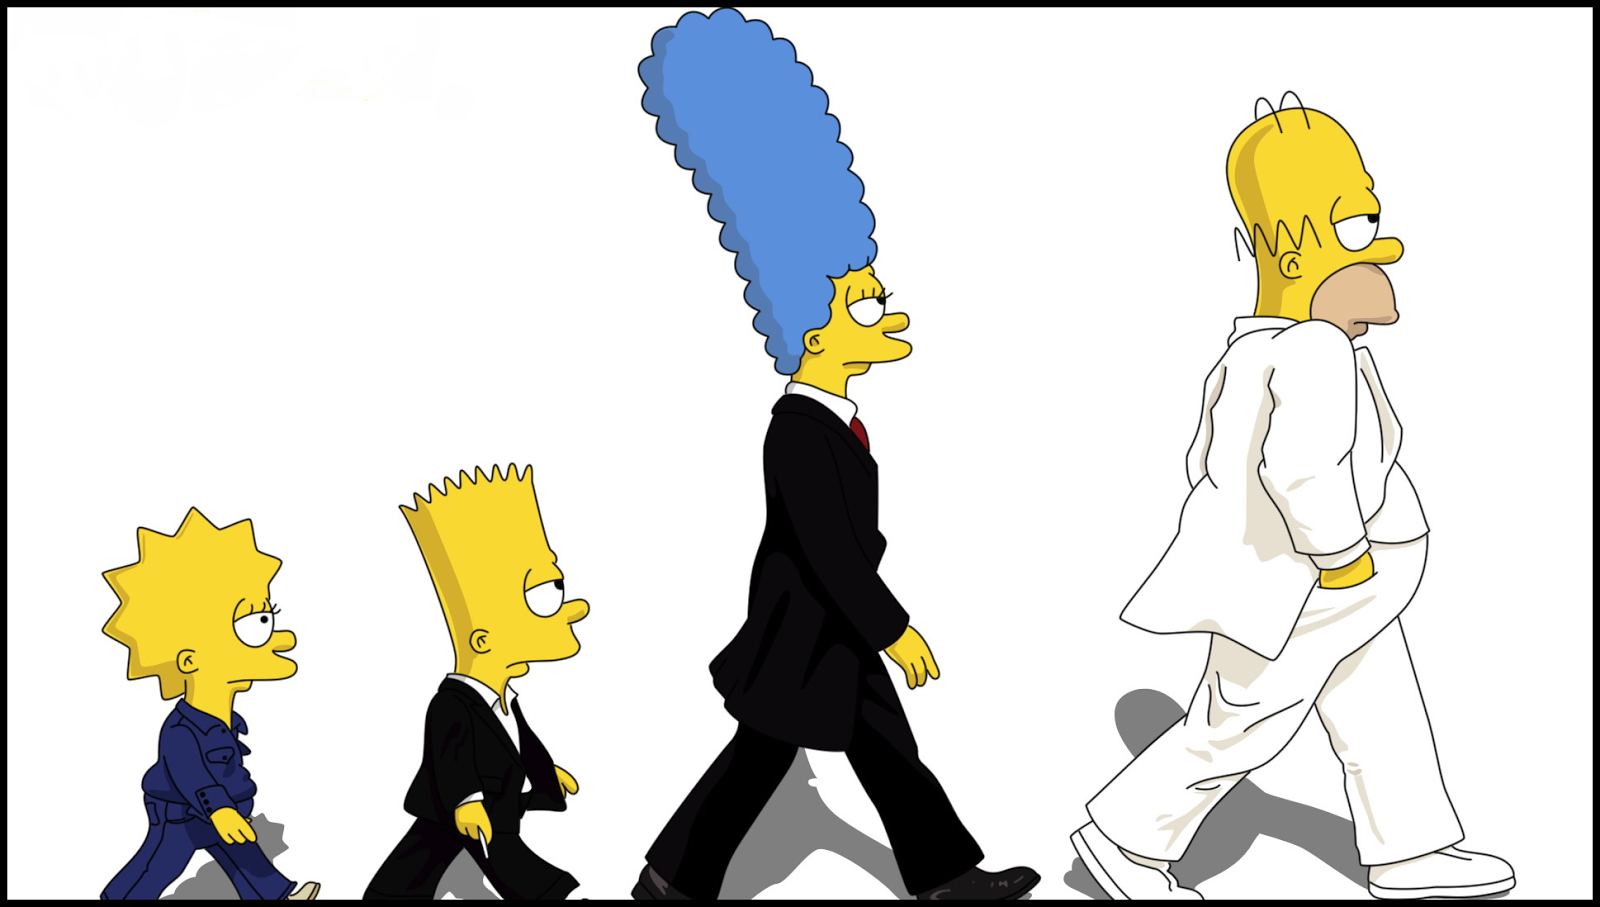 Www Girl Cartoon Wallpaper Com Wallpapers De S 233 Ries Wallpapers The Simpsons Papeis De